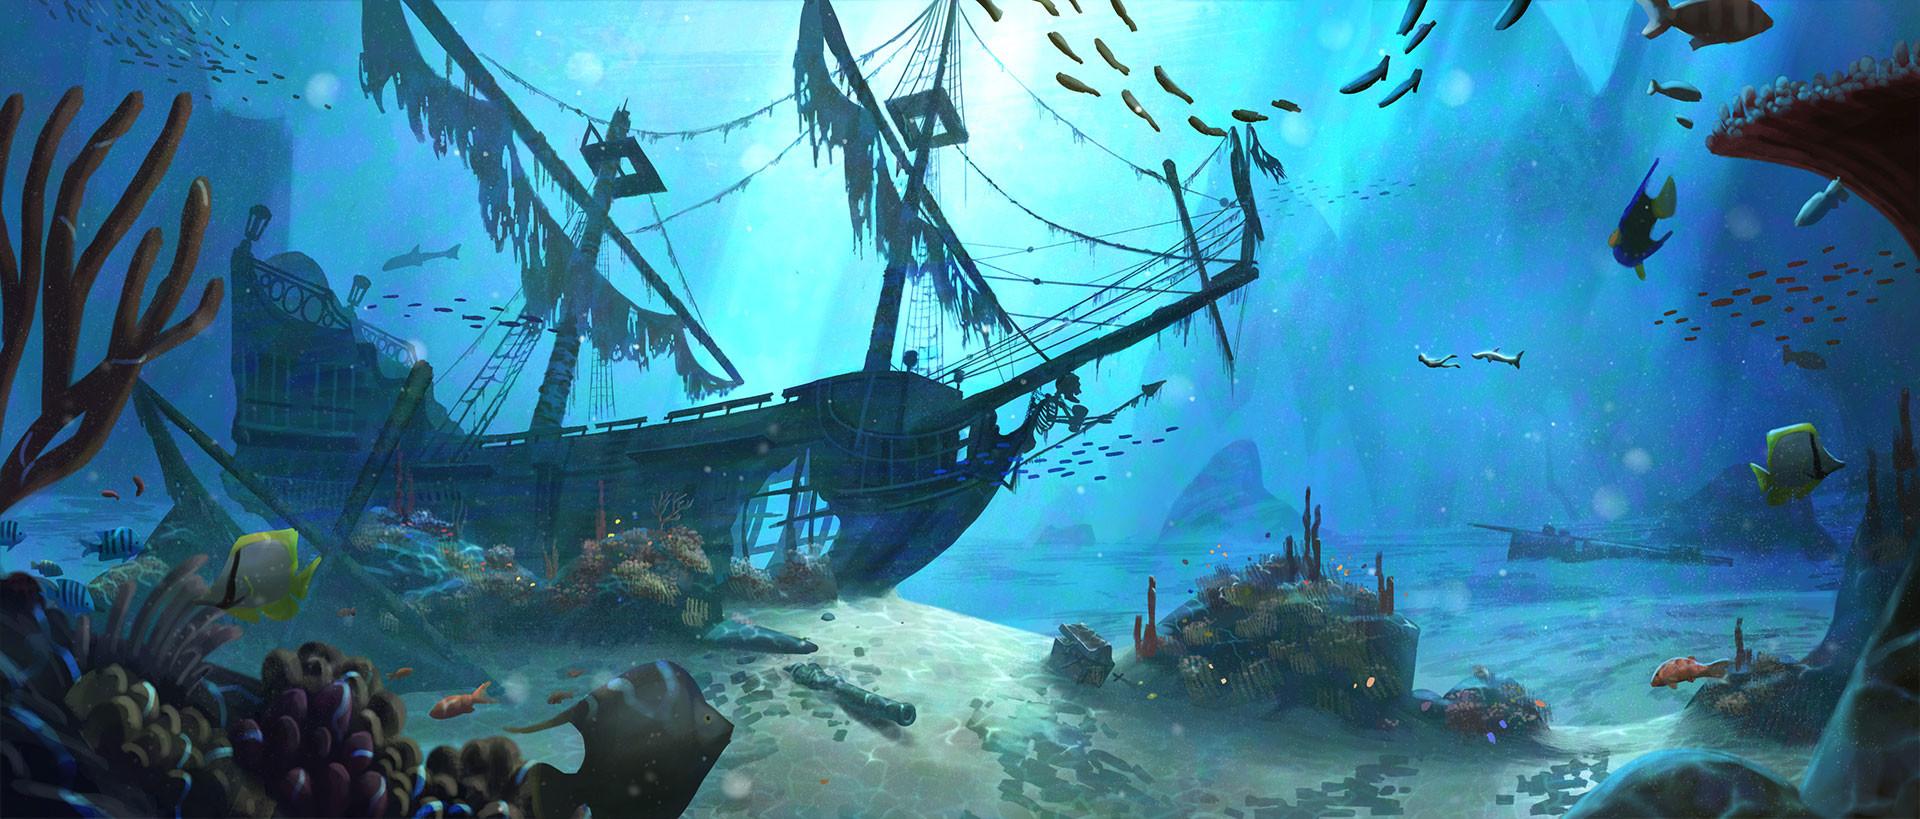 Animated Underwater Wallpaper Artstation Sc Aquarium Cyril Jedor